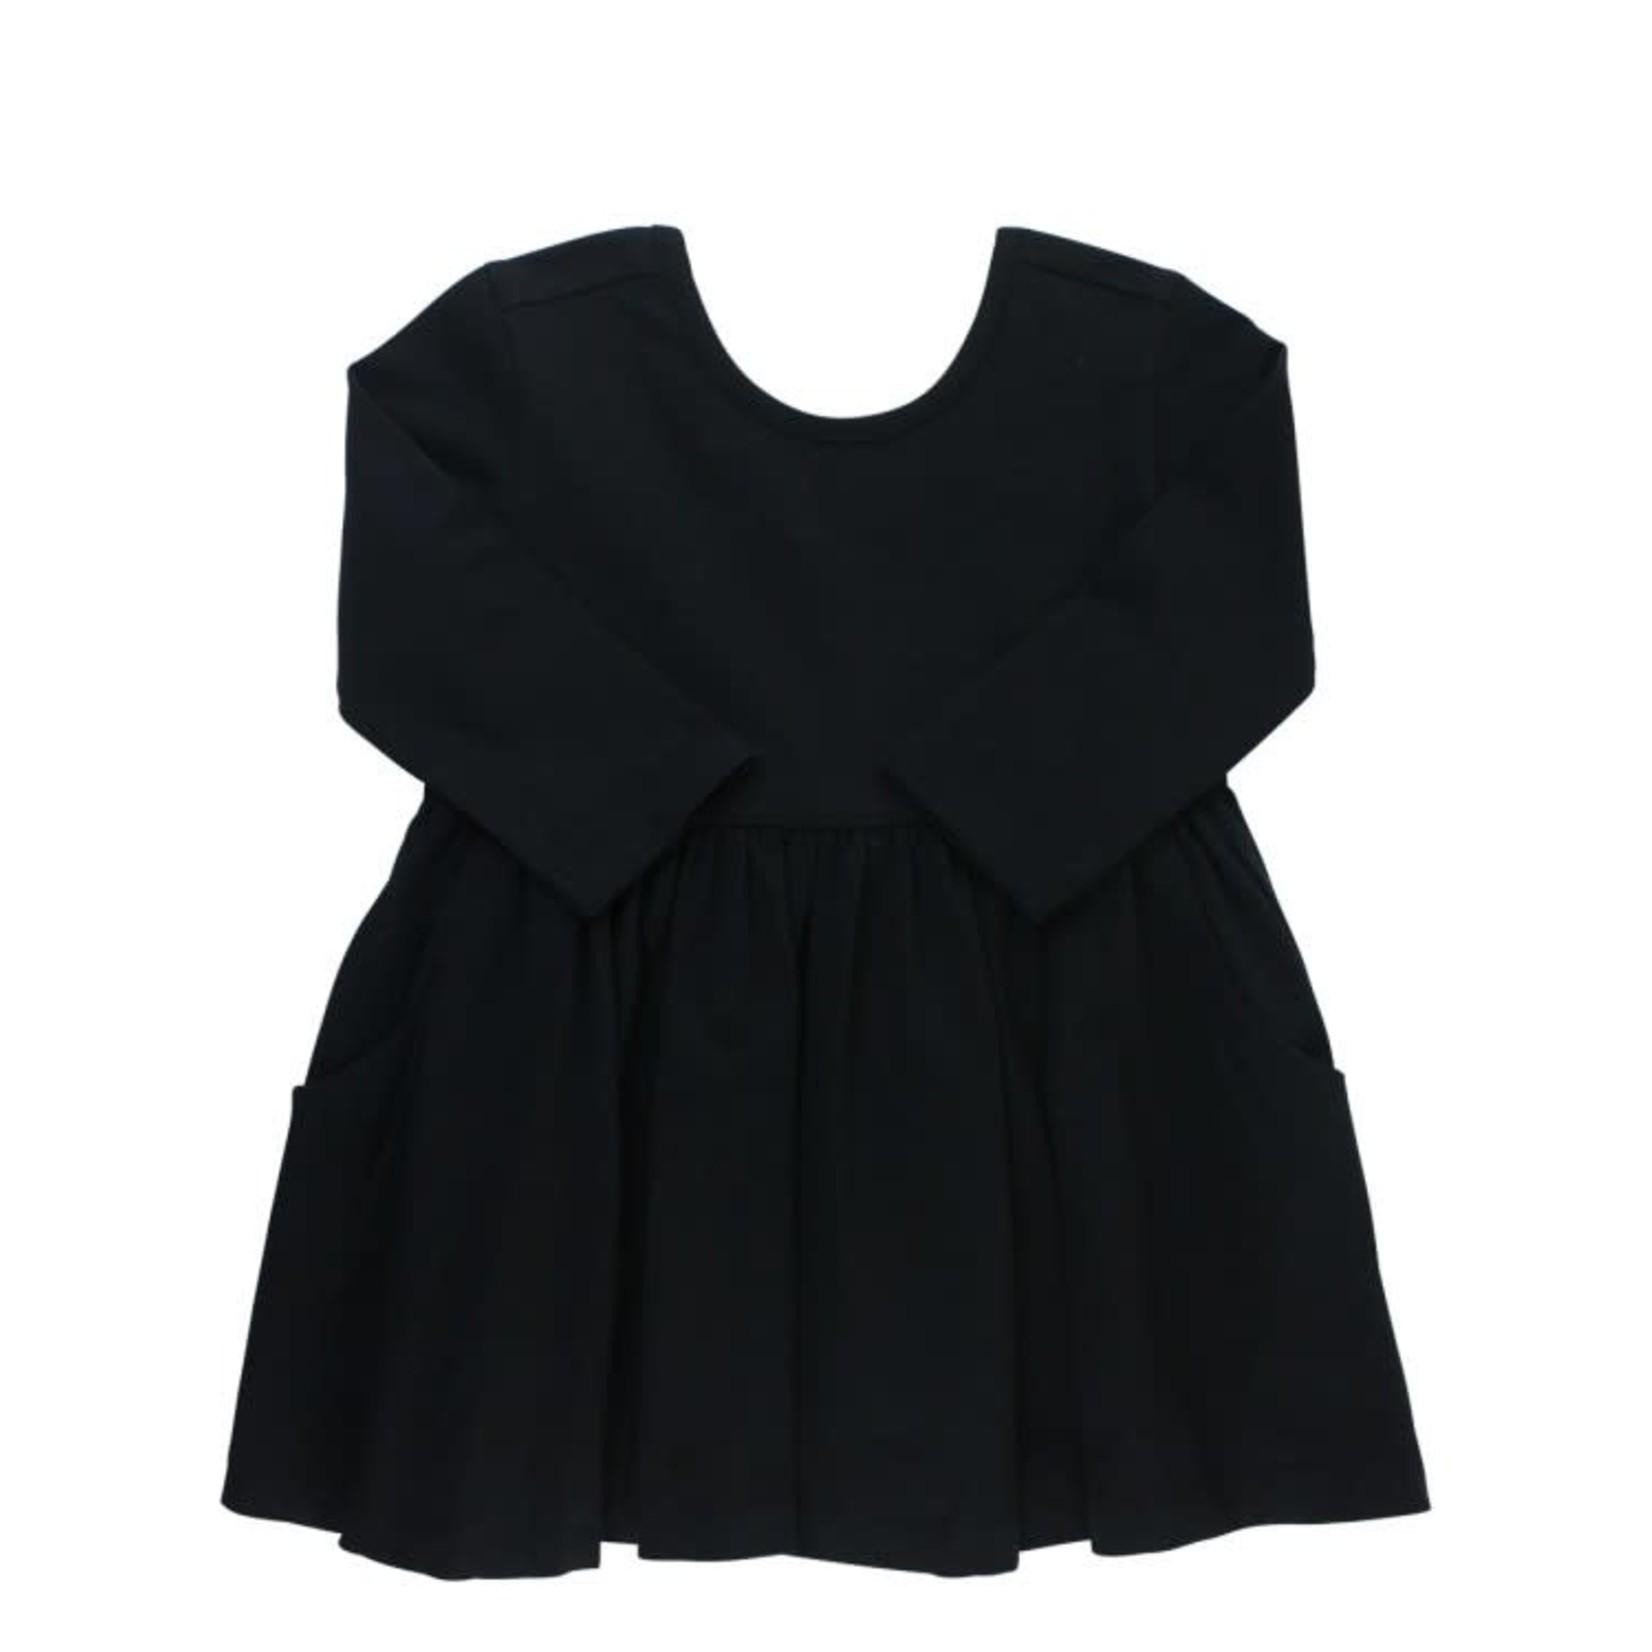 RuffleButts Twirl Dress, Black